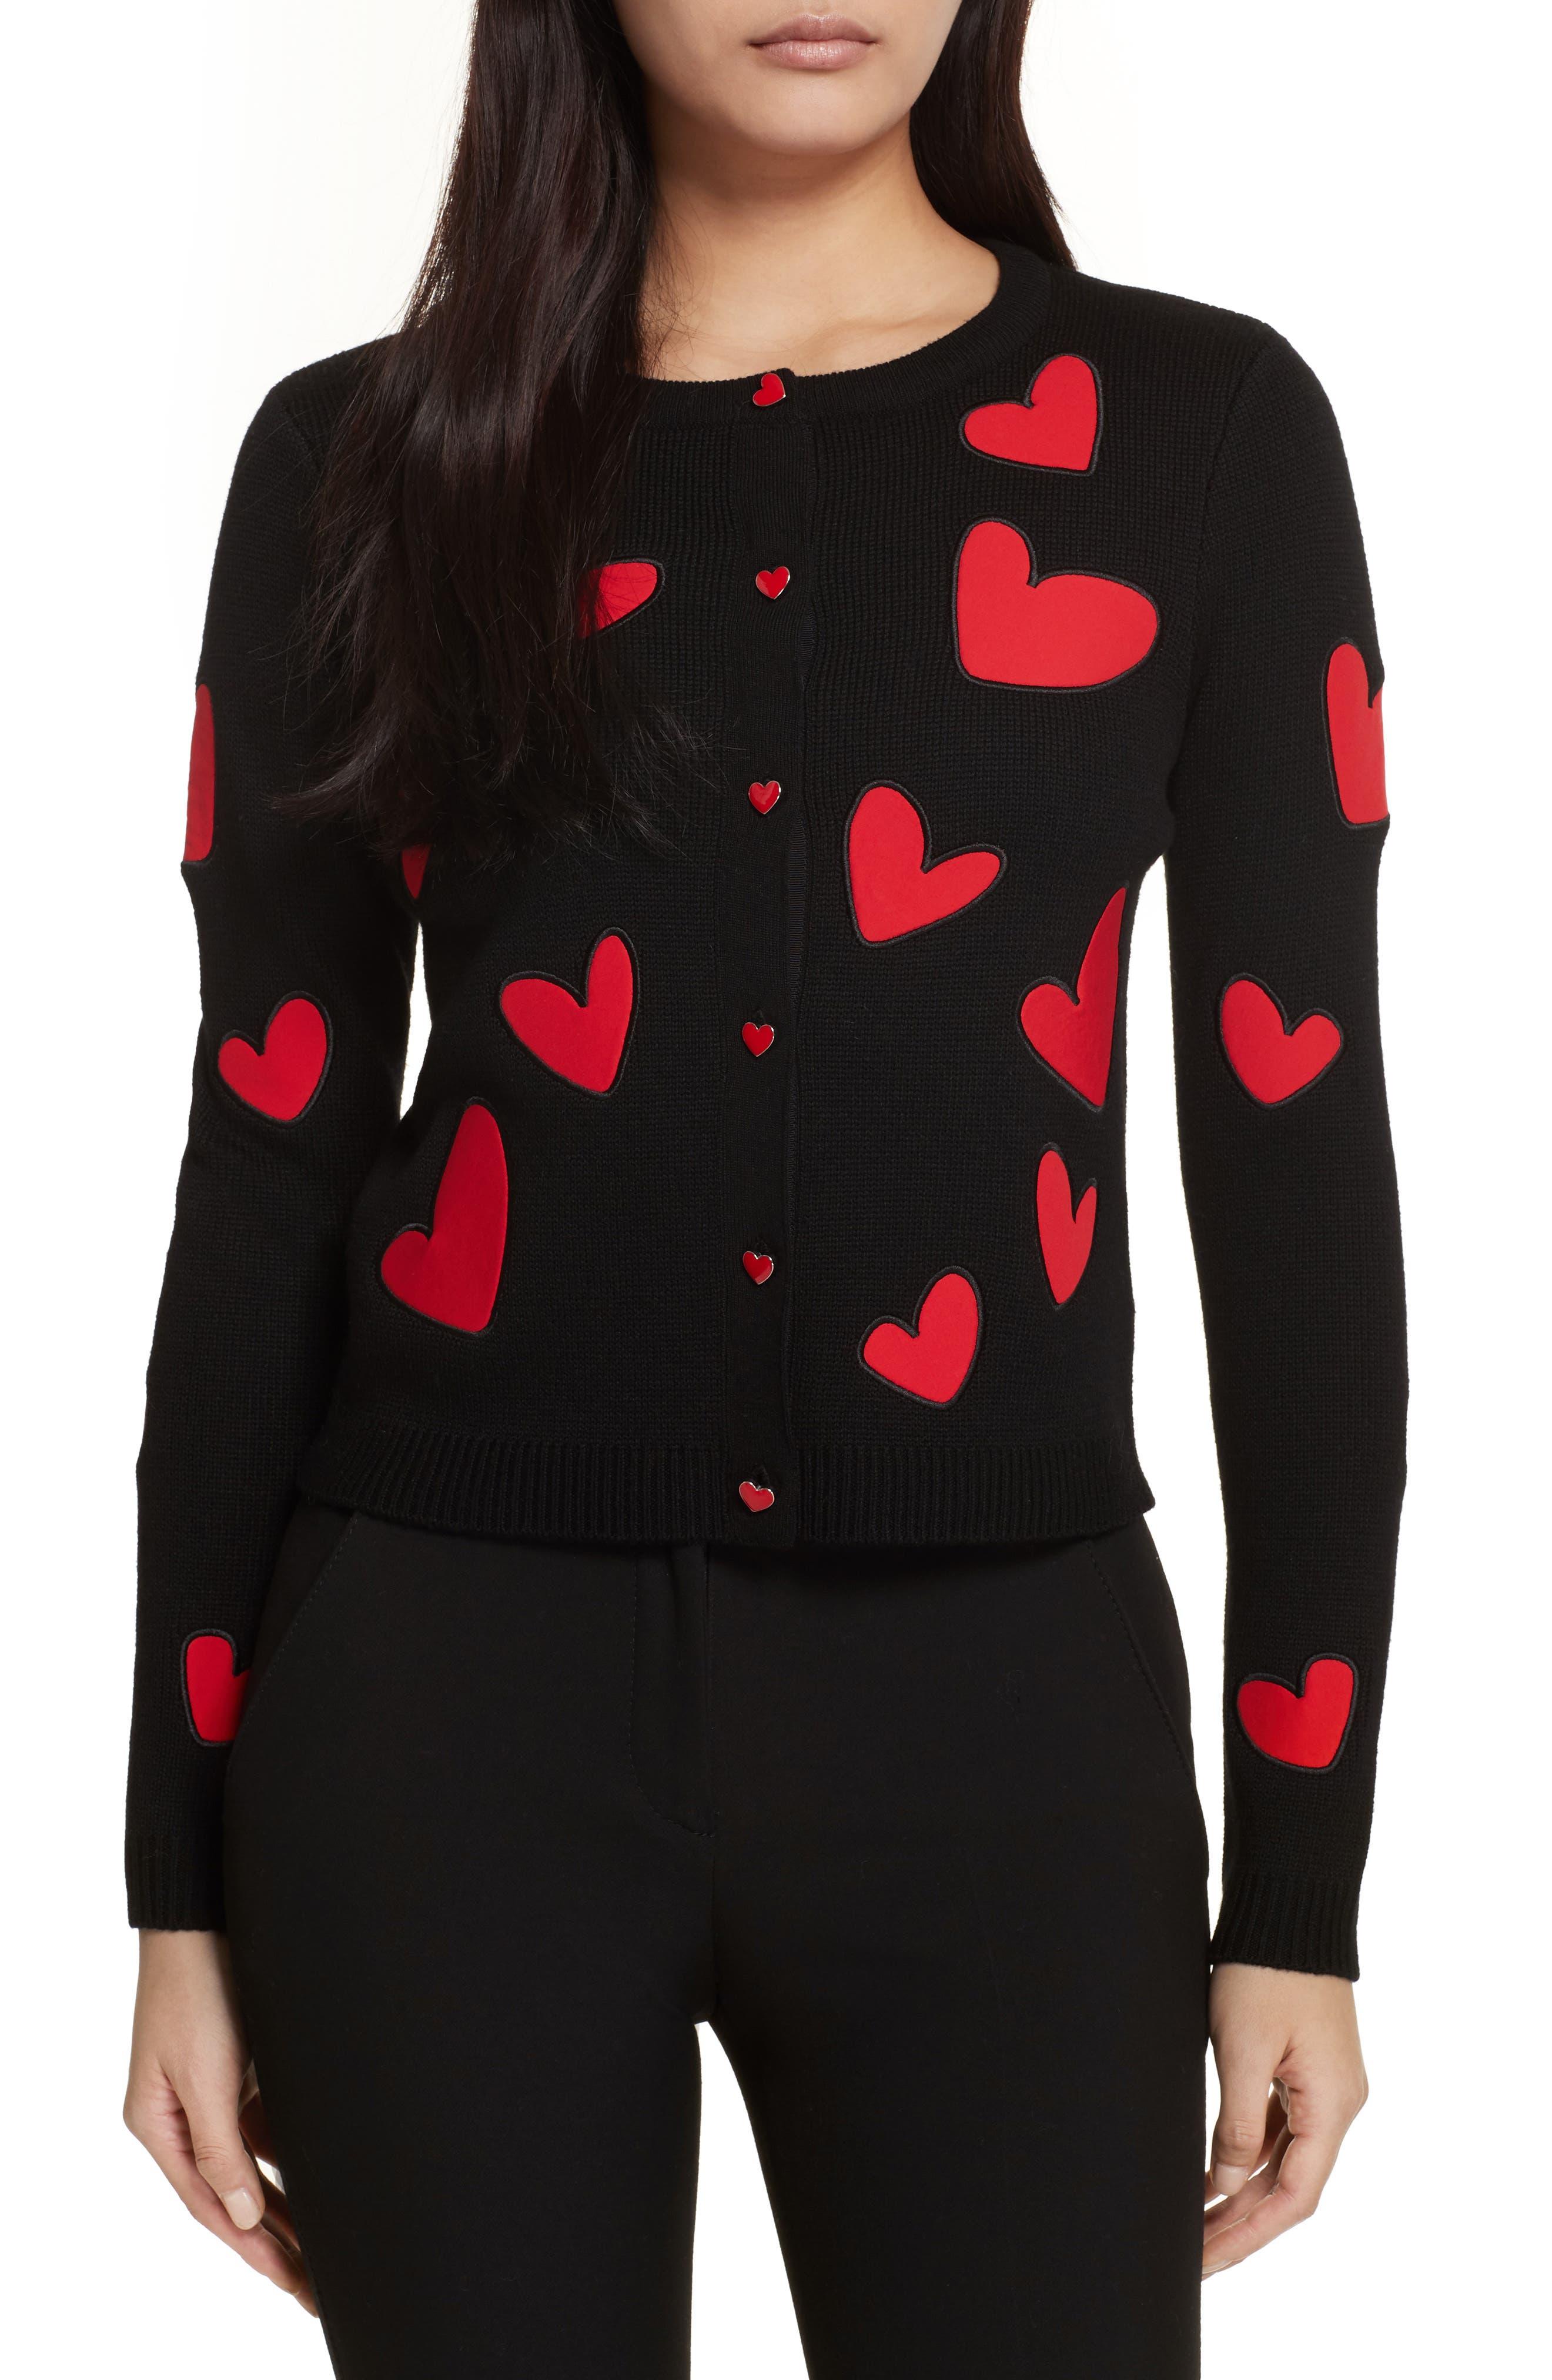 Ruthy Heart Appliqué Cardigan,                         Main,                         color, 012